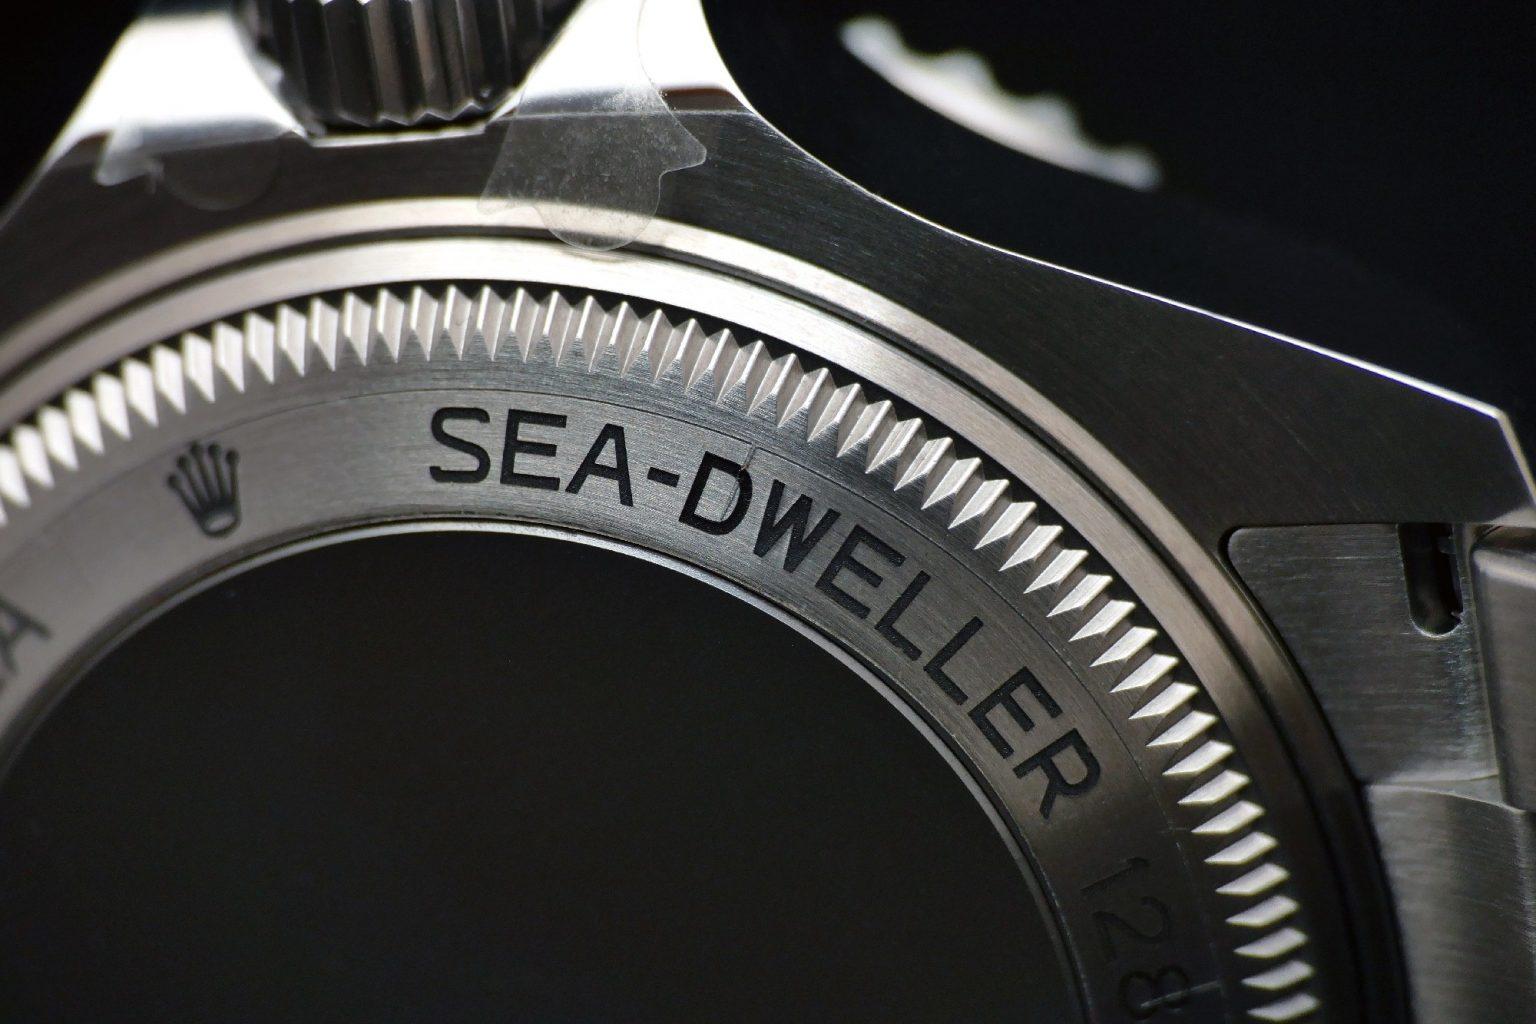 Sea-Dweller DeepSea